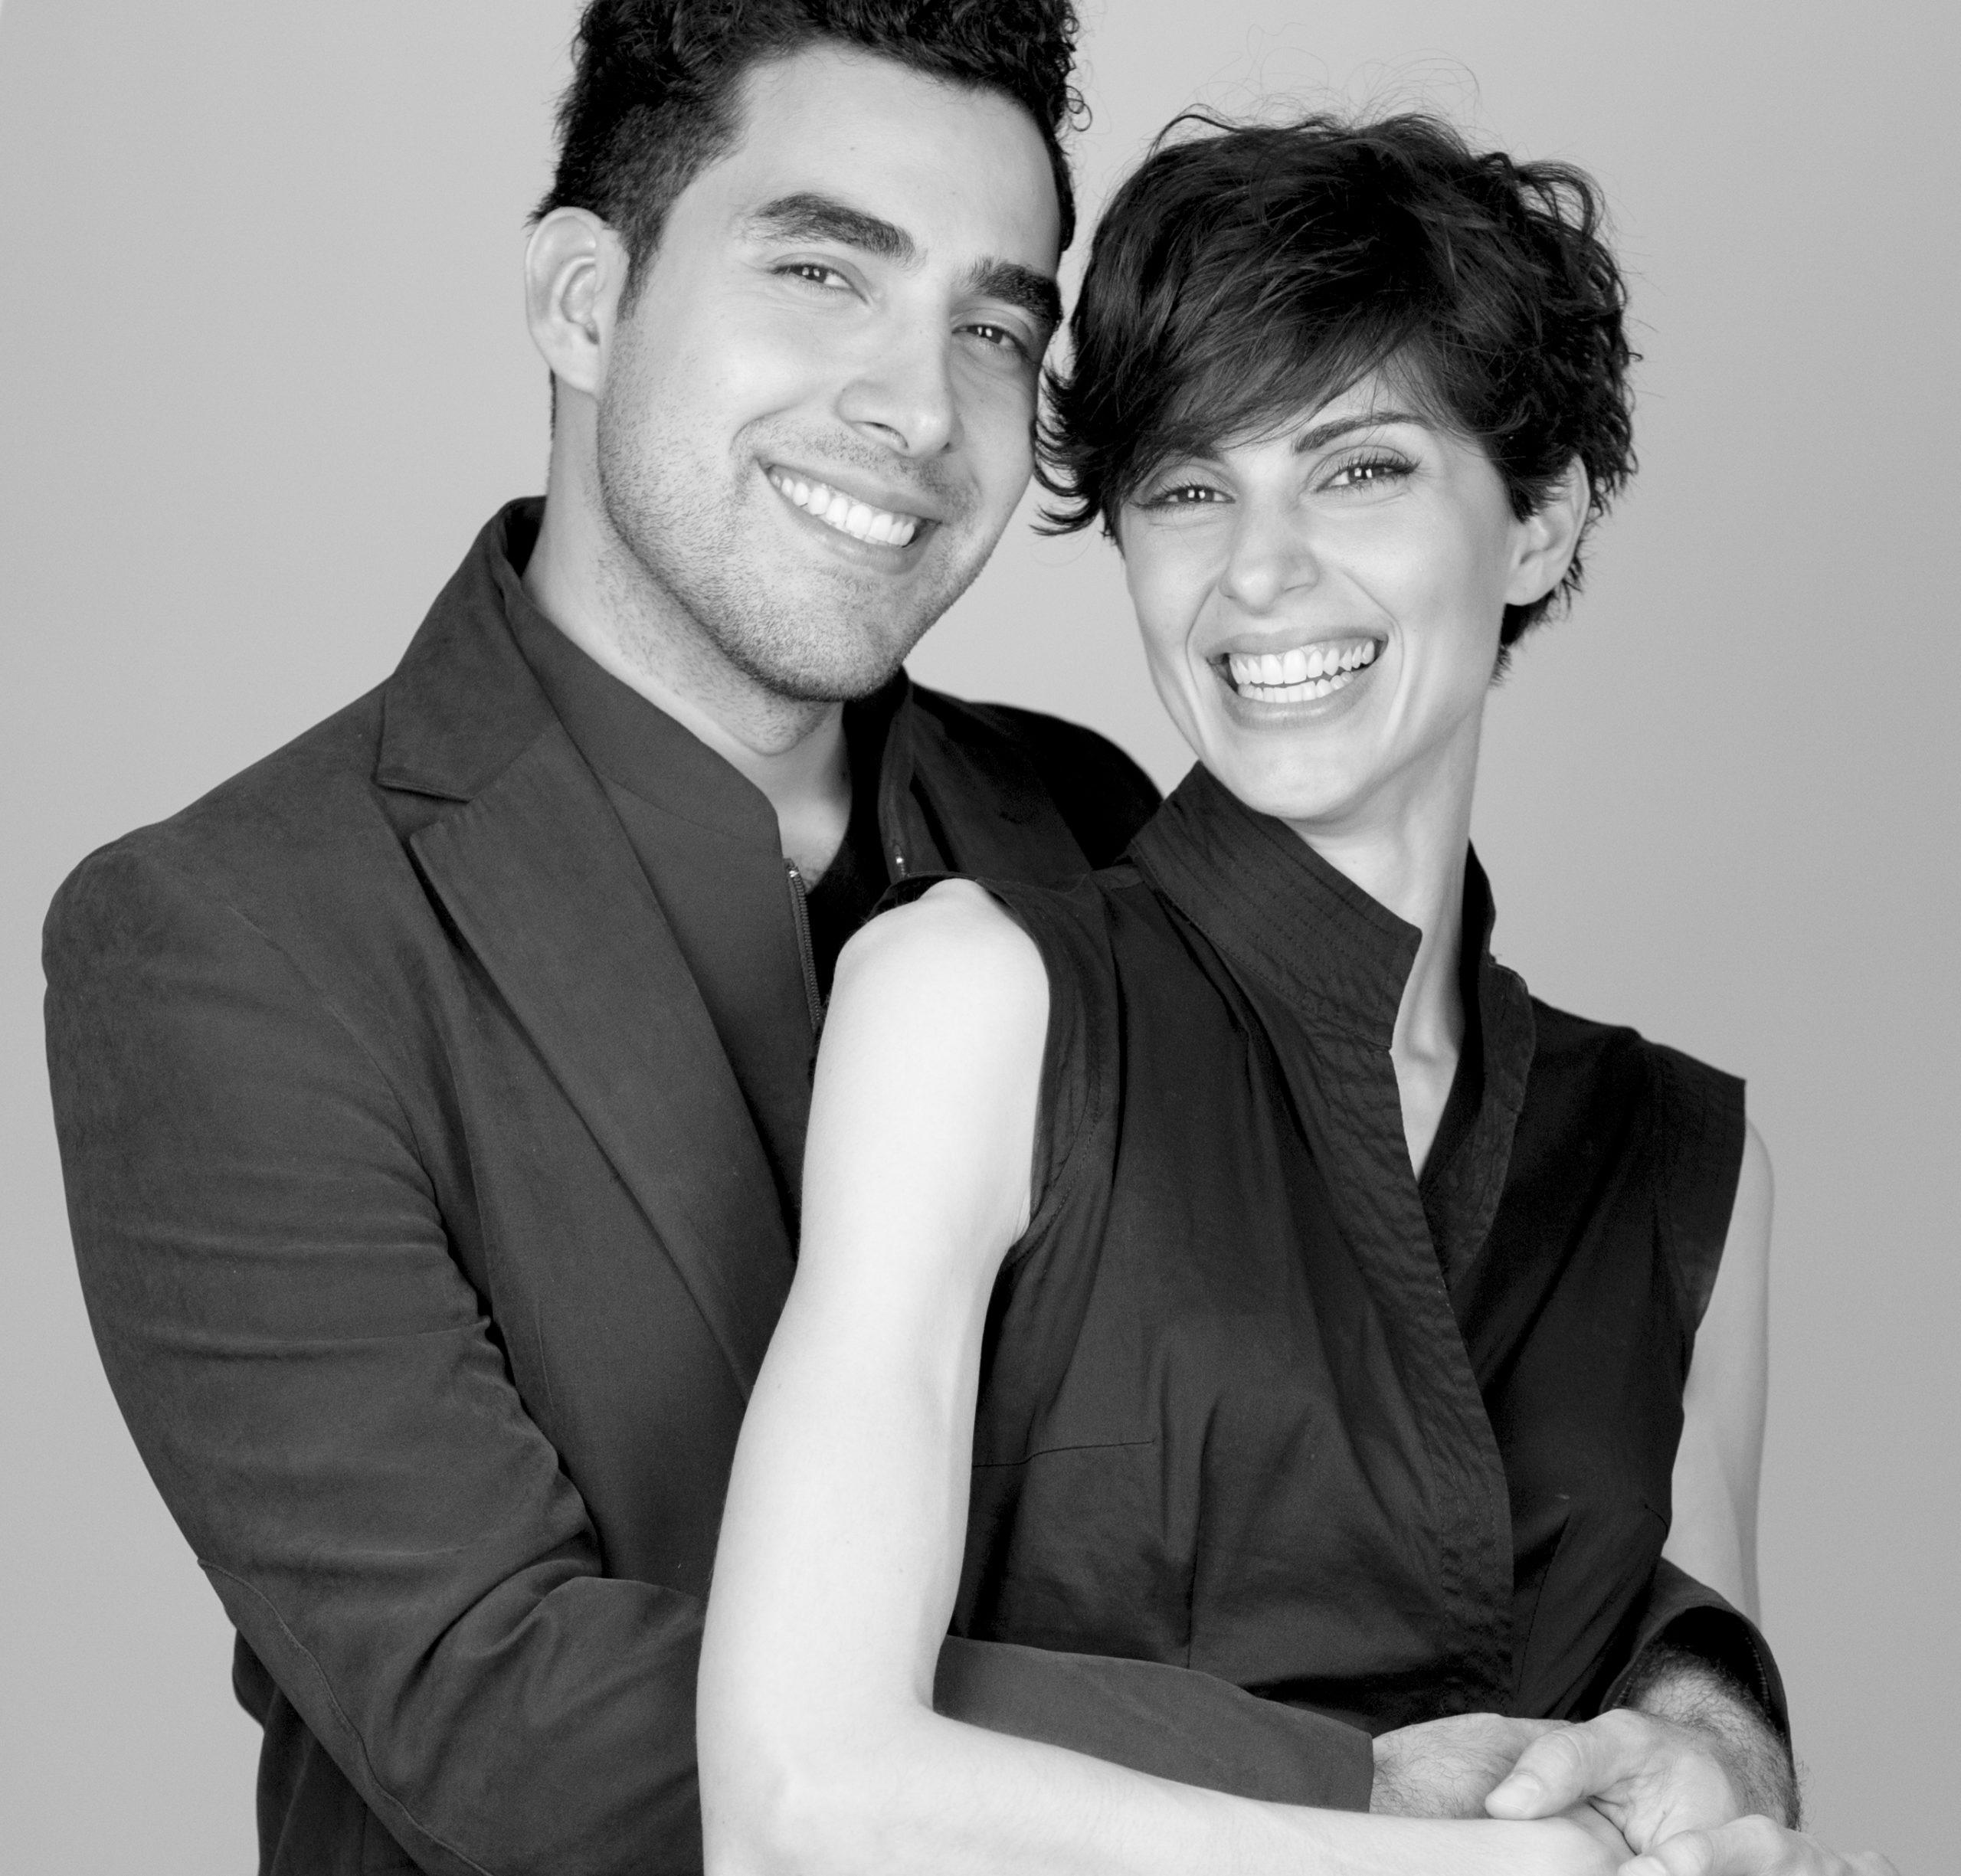 Jandro & Cristina (Black and White)